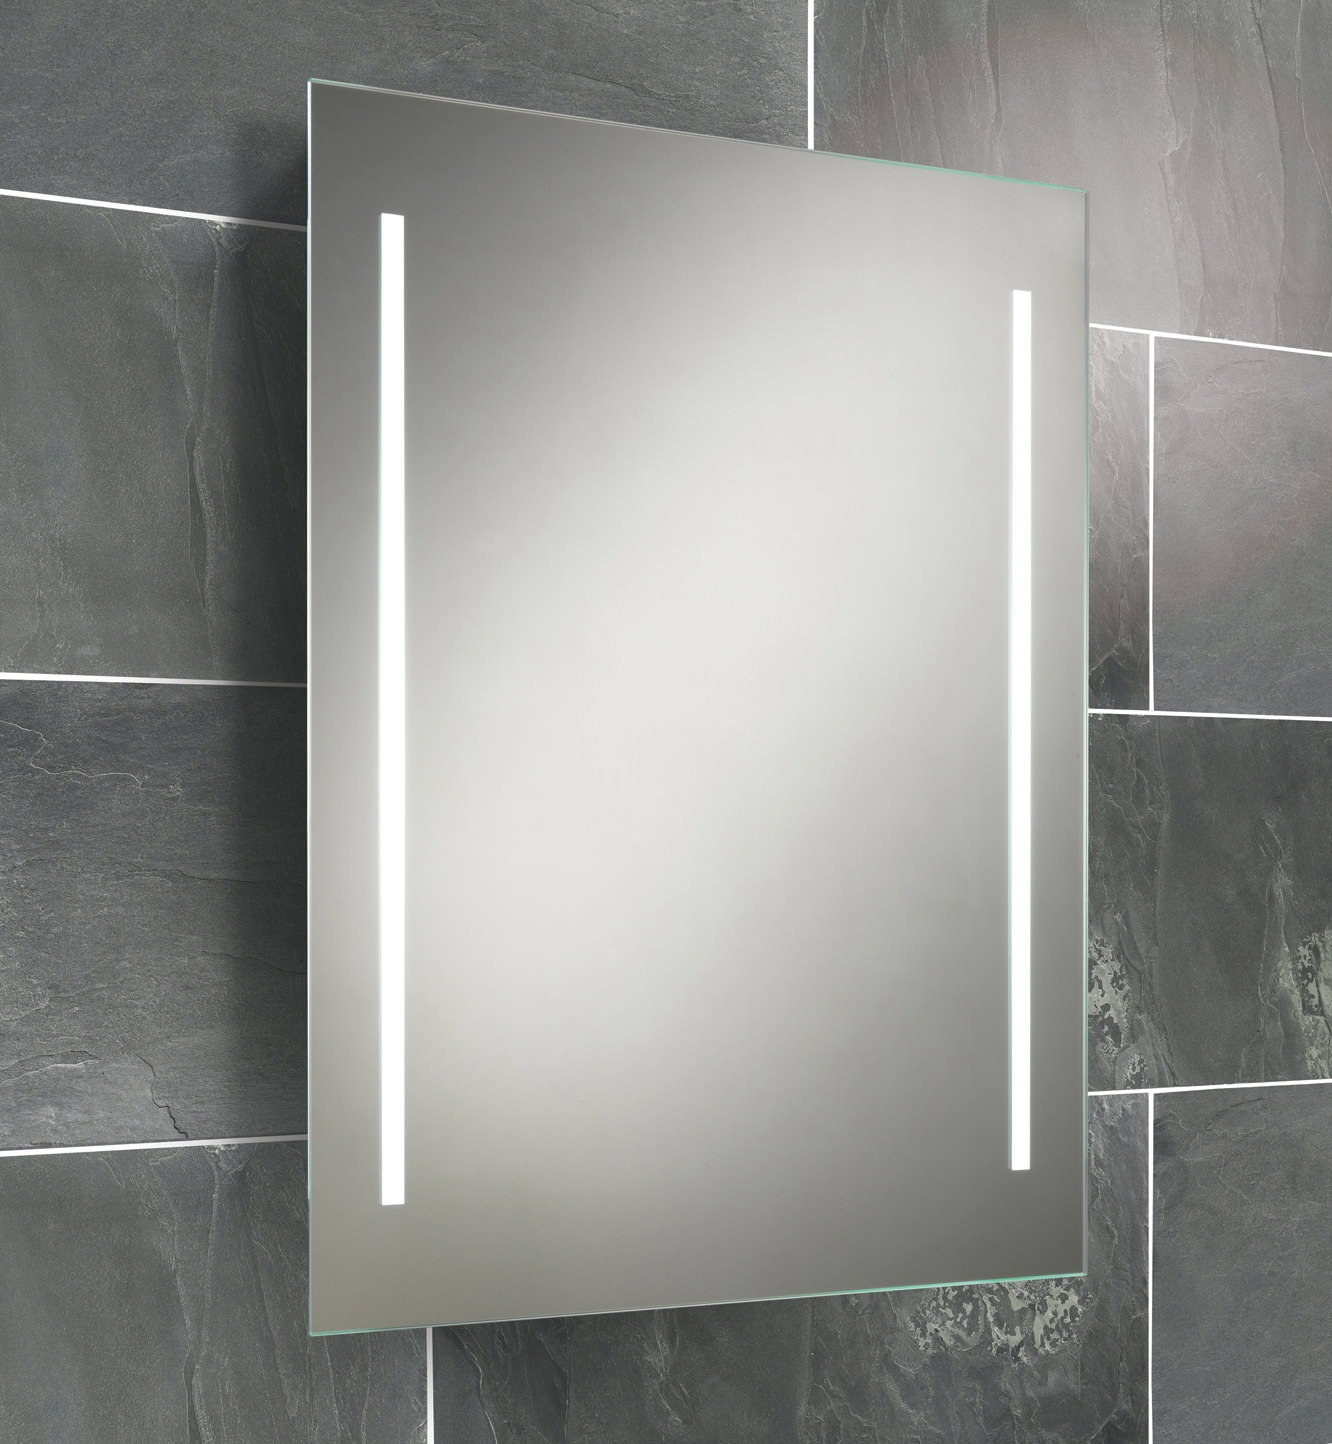 Battery Illuminated Mirrors For Bathrooms